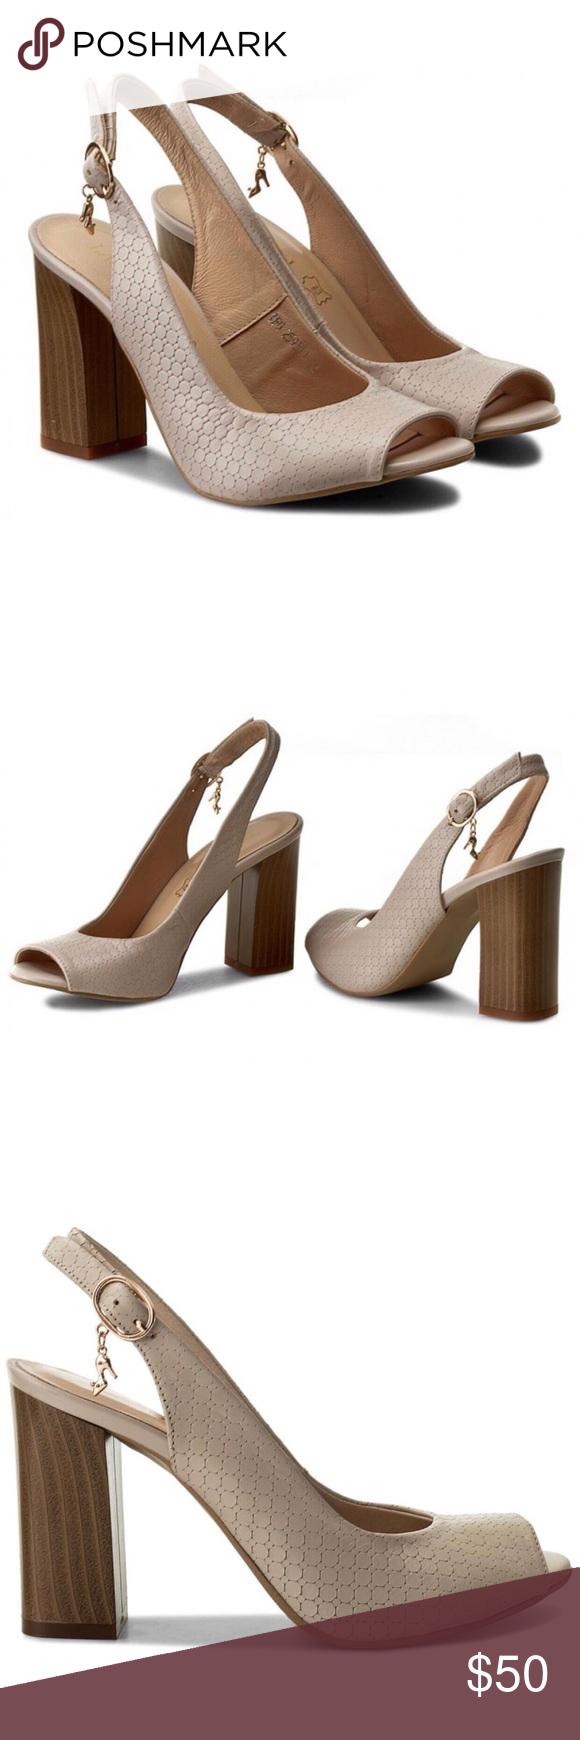 81c488e320c3 Lasocki  heels  •Lasocki •IN GREAT CONDITION! WORN ONCE!  additional pics  coming  •European sandals •beige •European size 39 Lasocki Shoes Heels